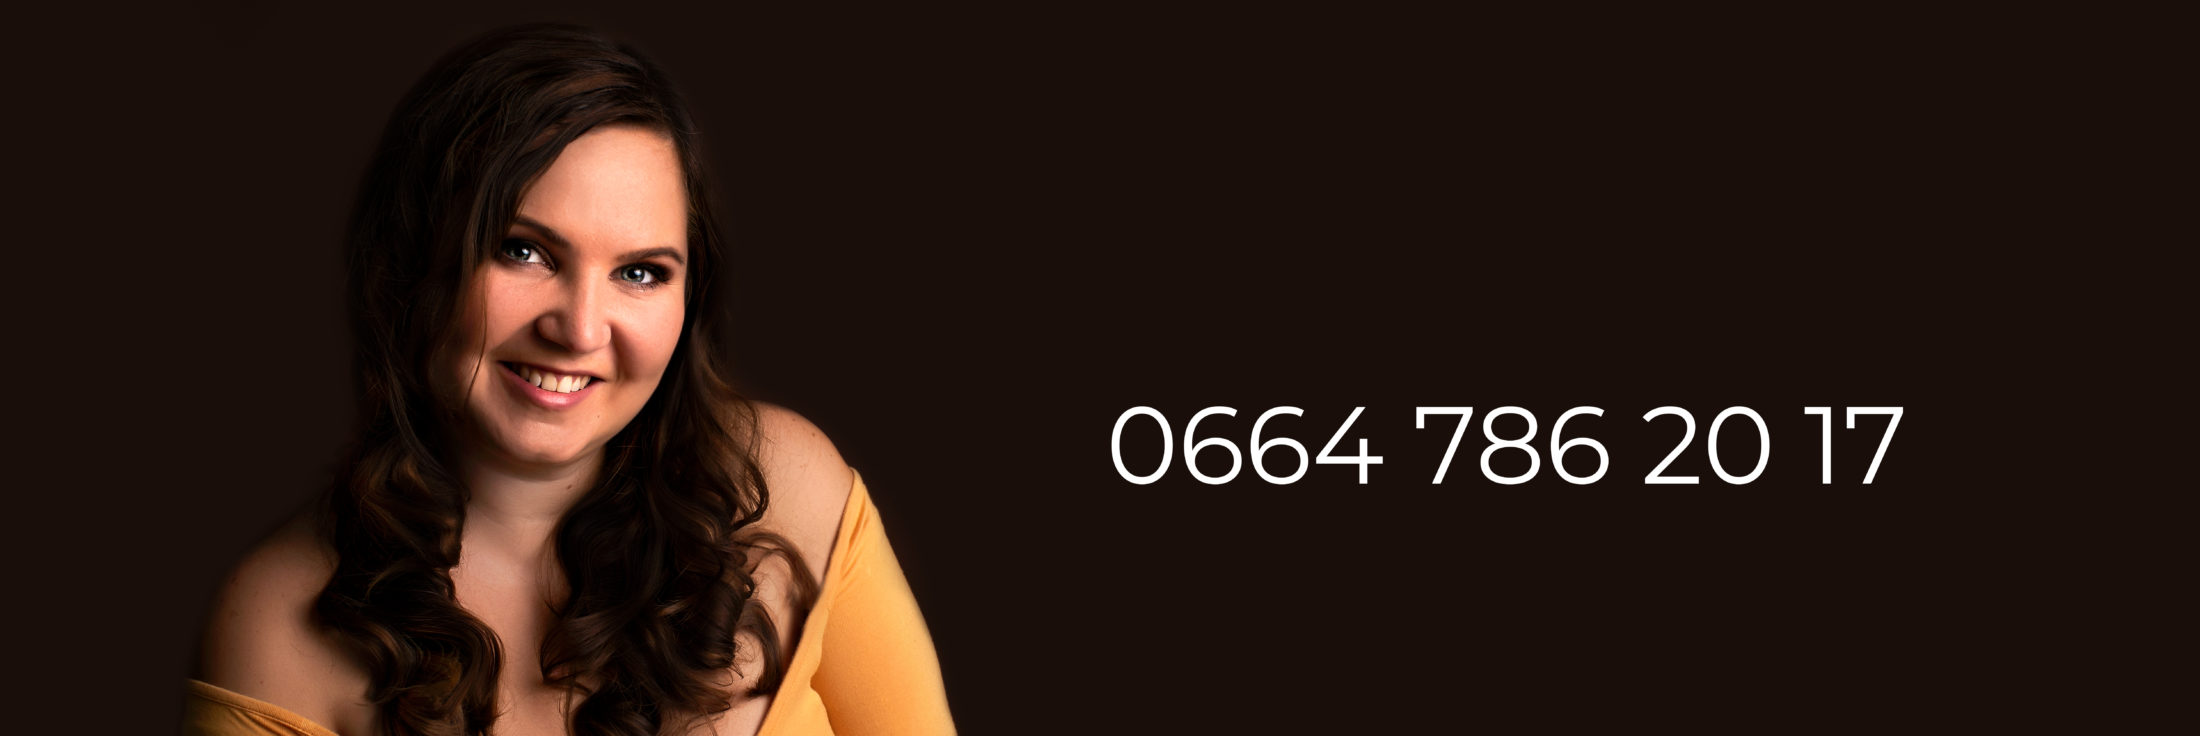 Pixberry Telefonnummer